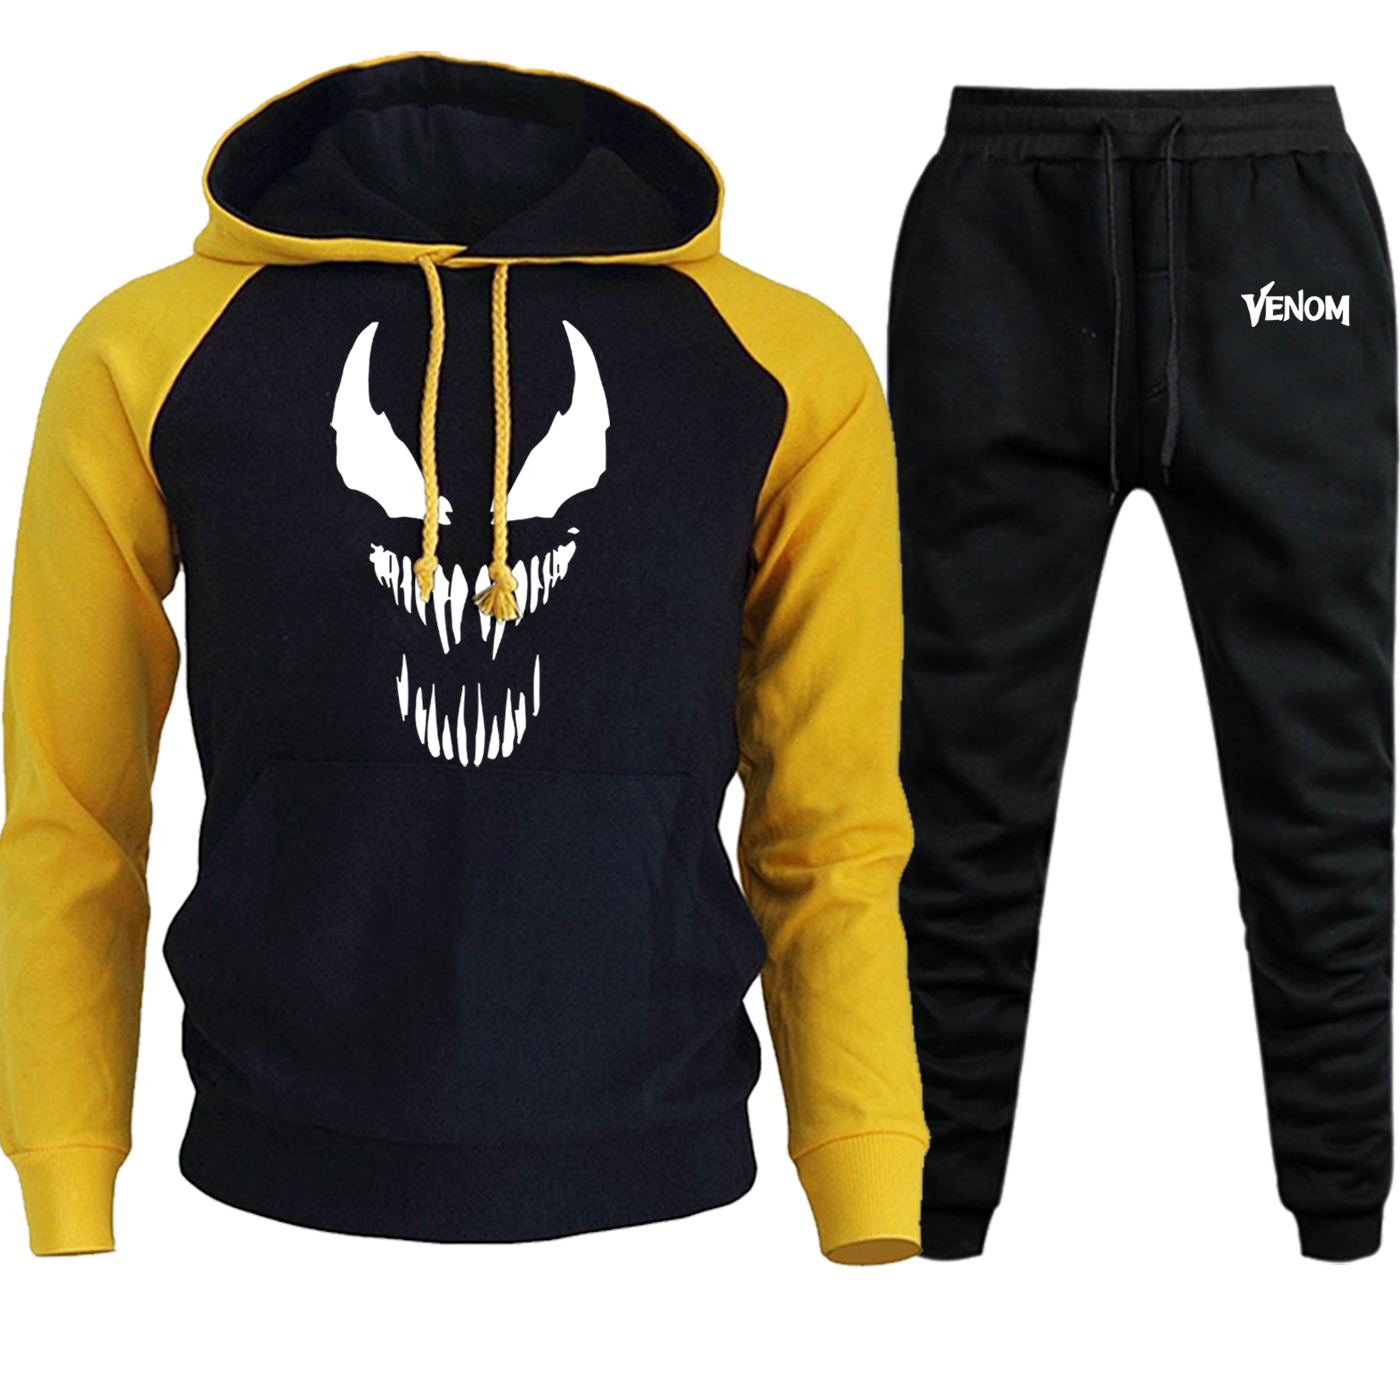 Venom Raglan Mens Hoodies Sweatshirts Autumn Winter New 2019 Suit Male Casual Fleece Hooded Marvel Pullover+Pants 2 Piece Set